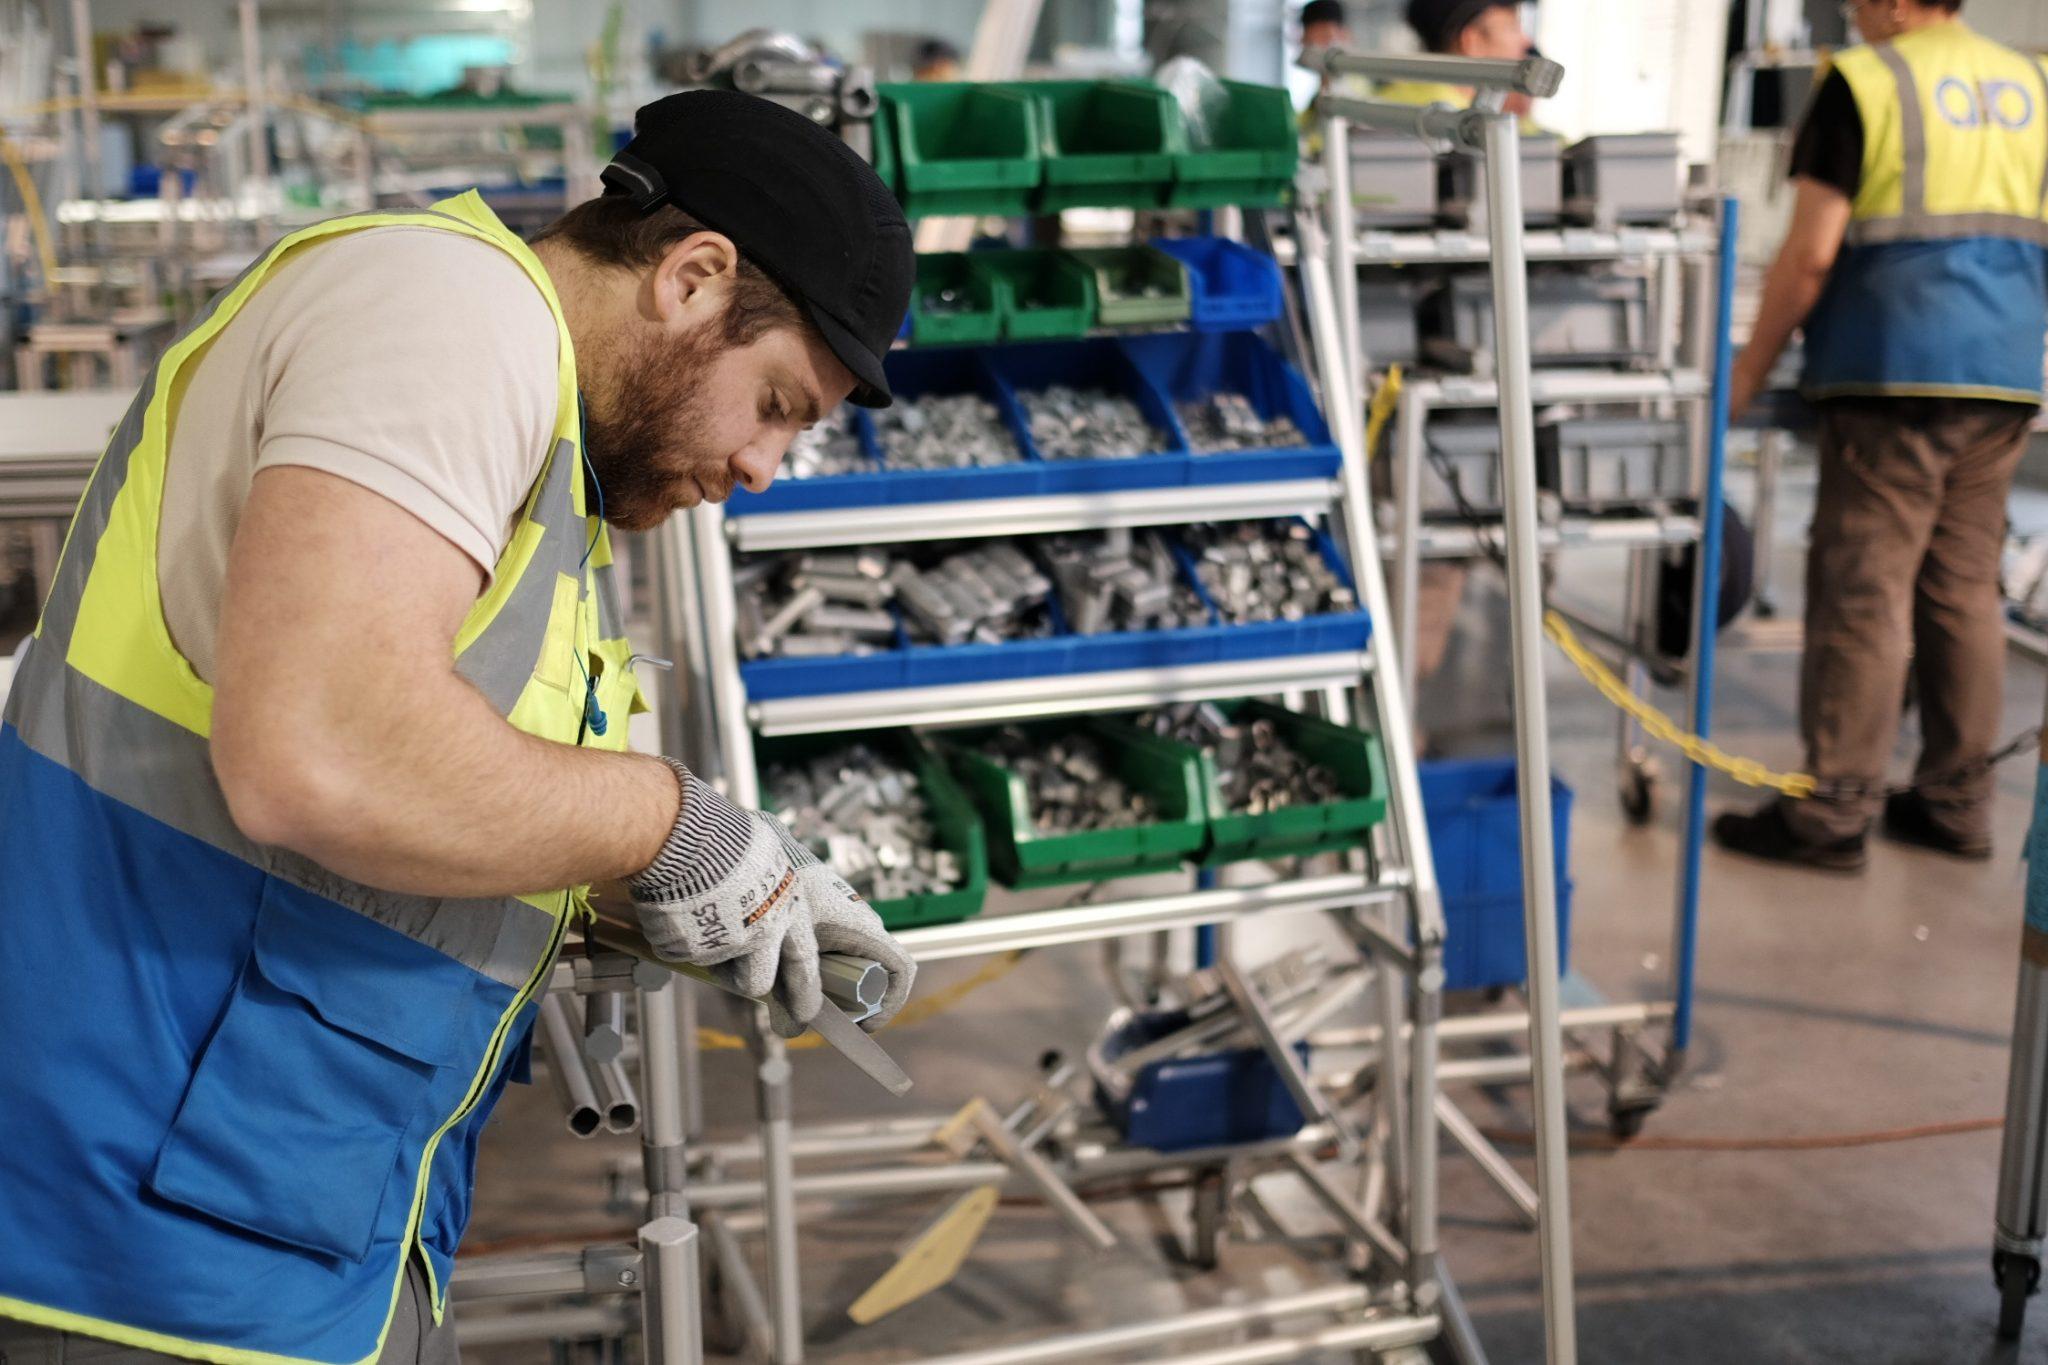 Man working in a factory with lean and kaizen Karakuri Kaizen